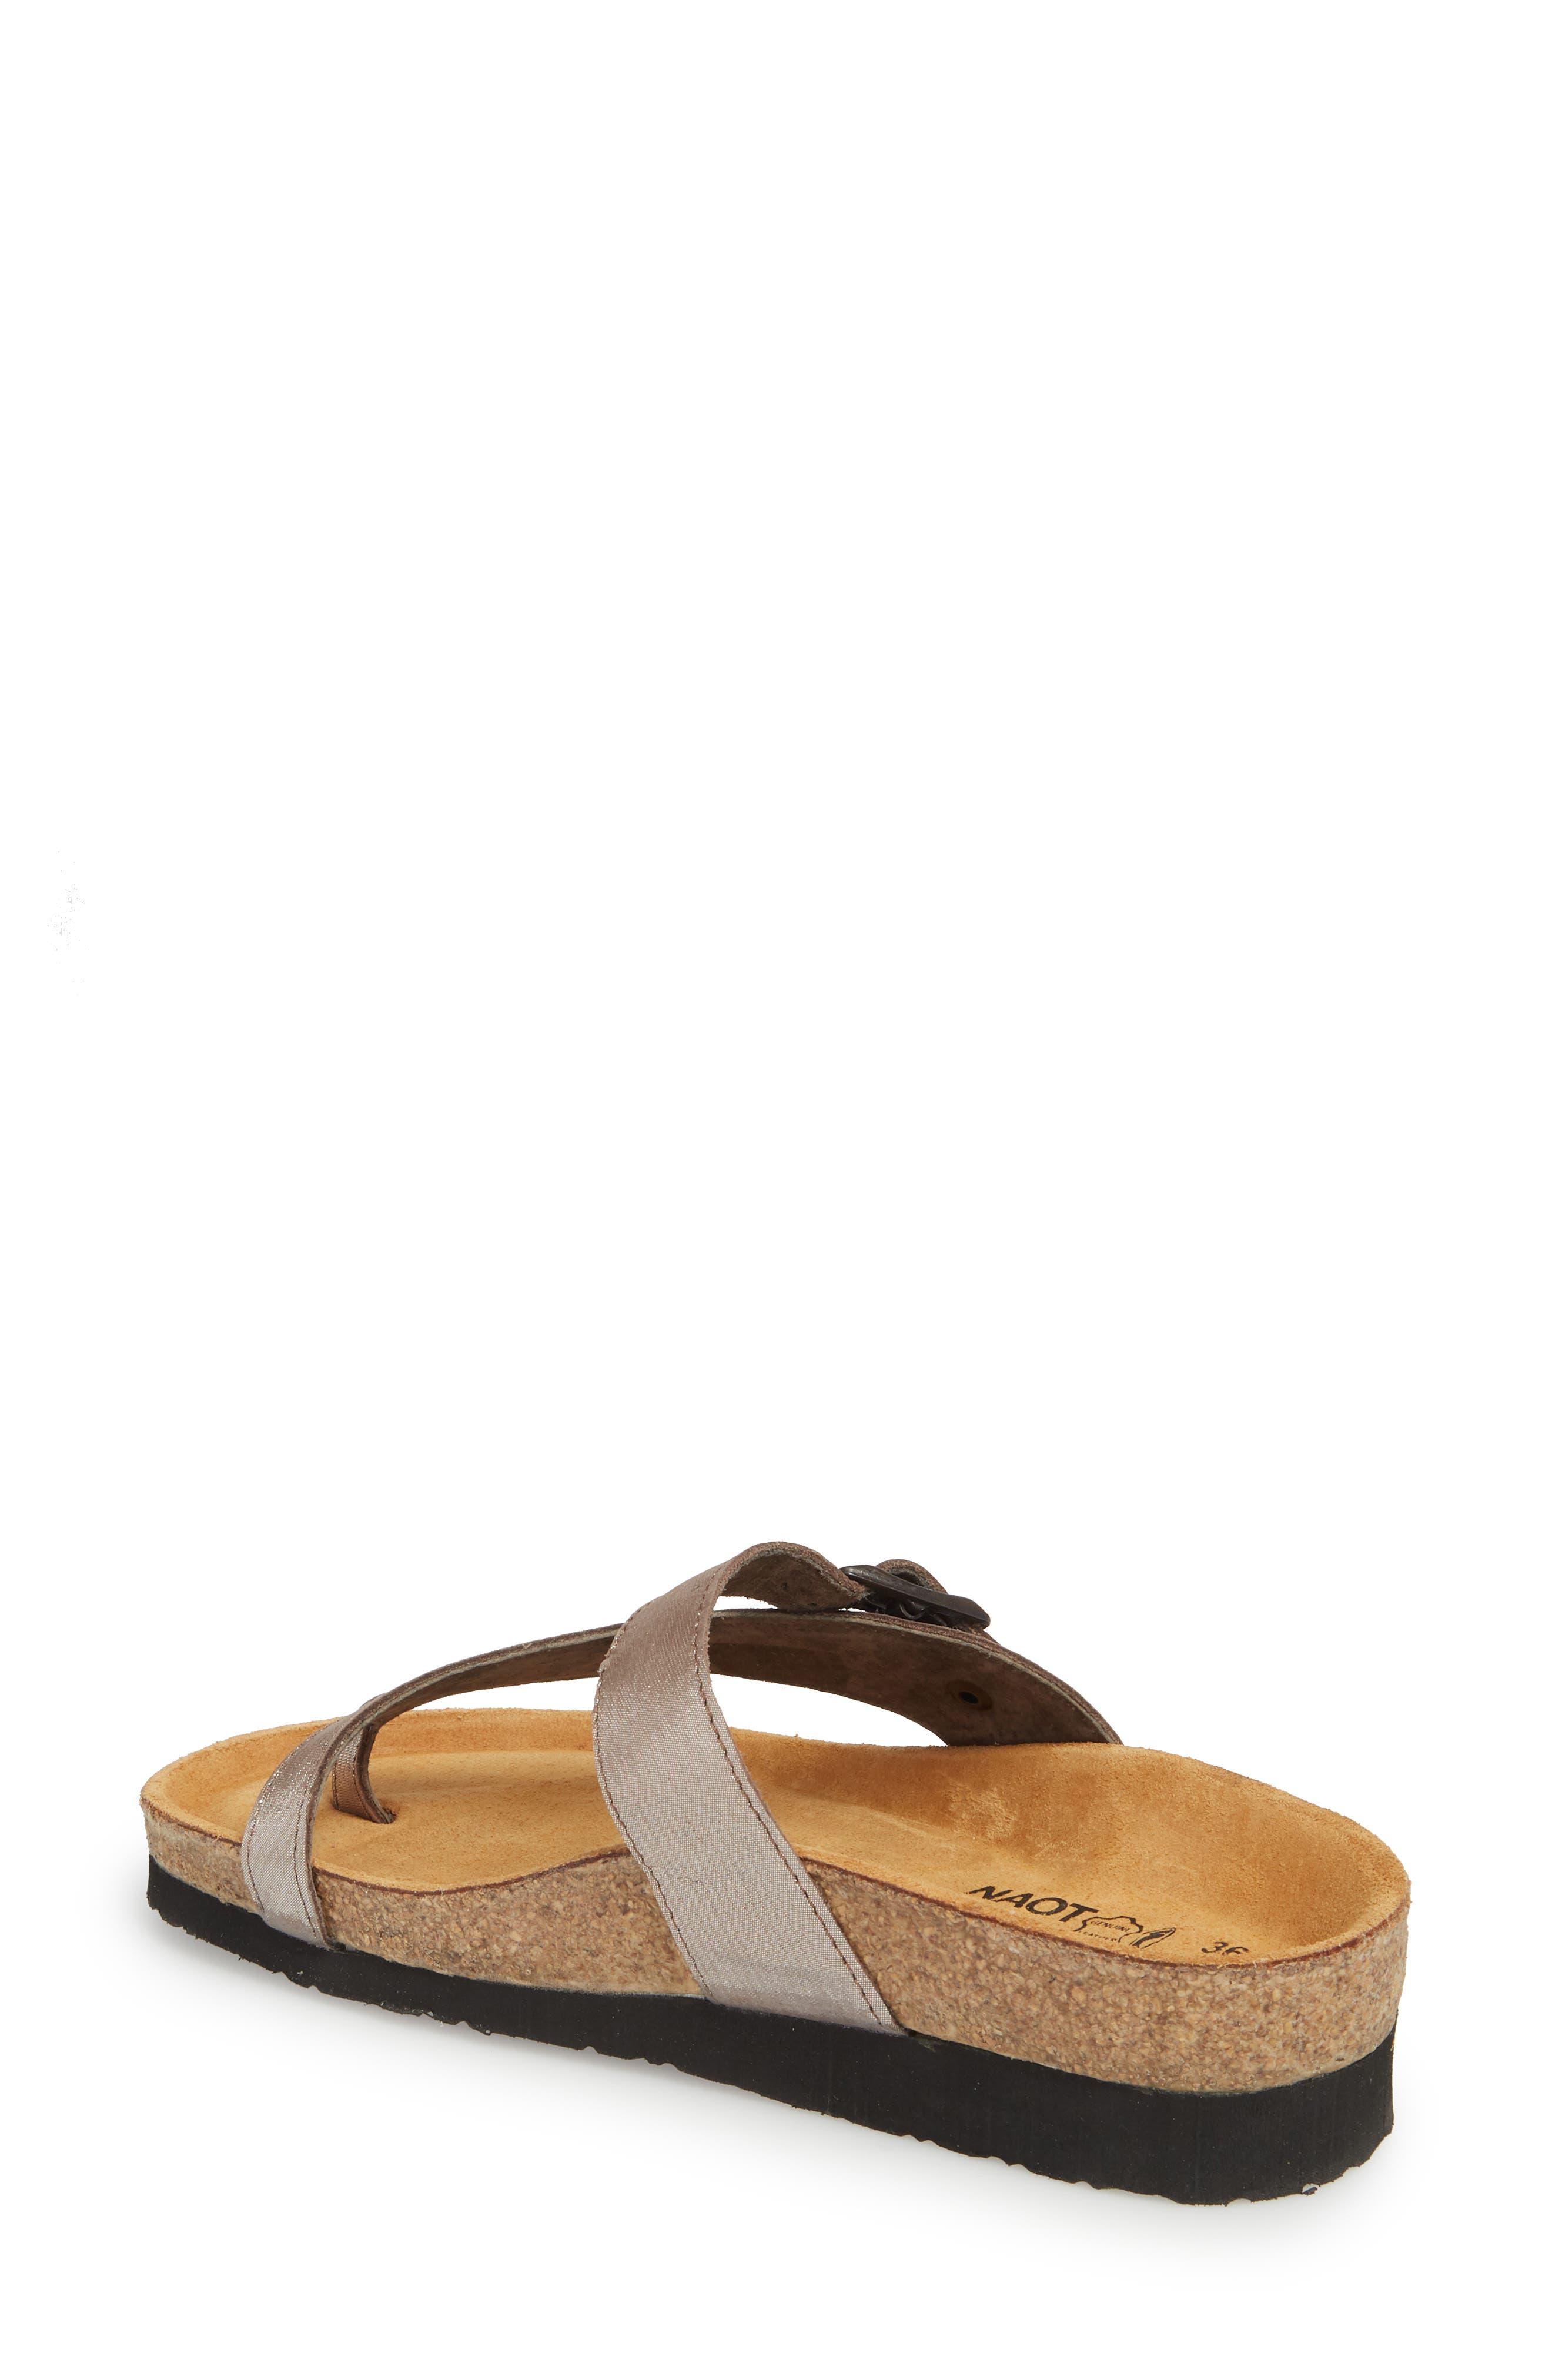 'Tahoe' Sandal,                             Alternate thumbnail 2, color,                             Silver Leather